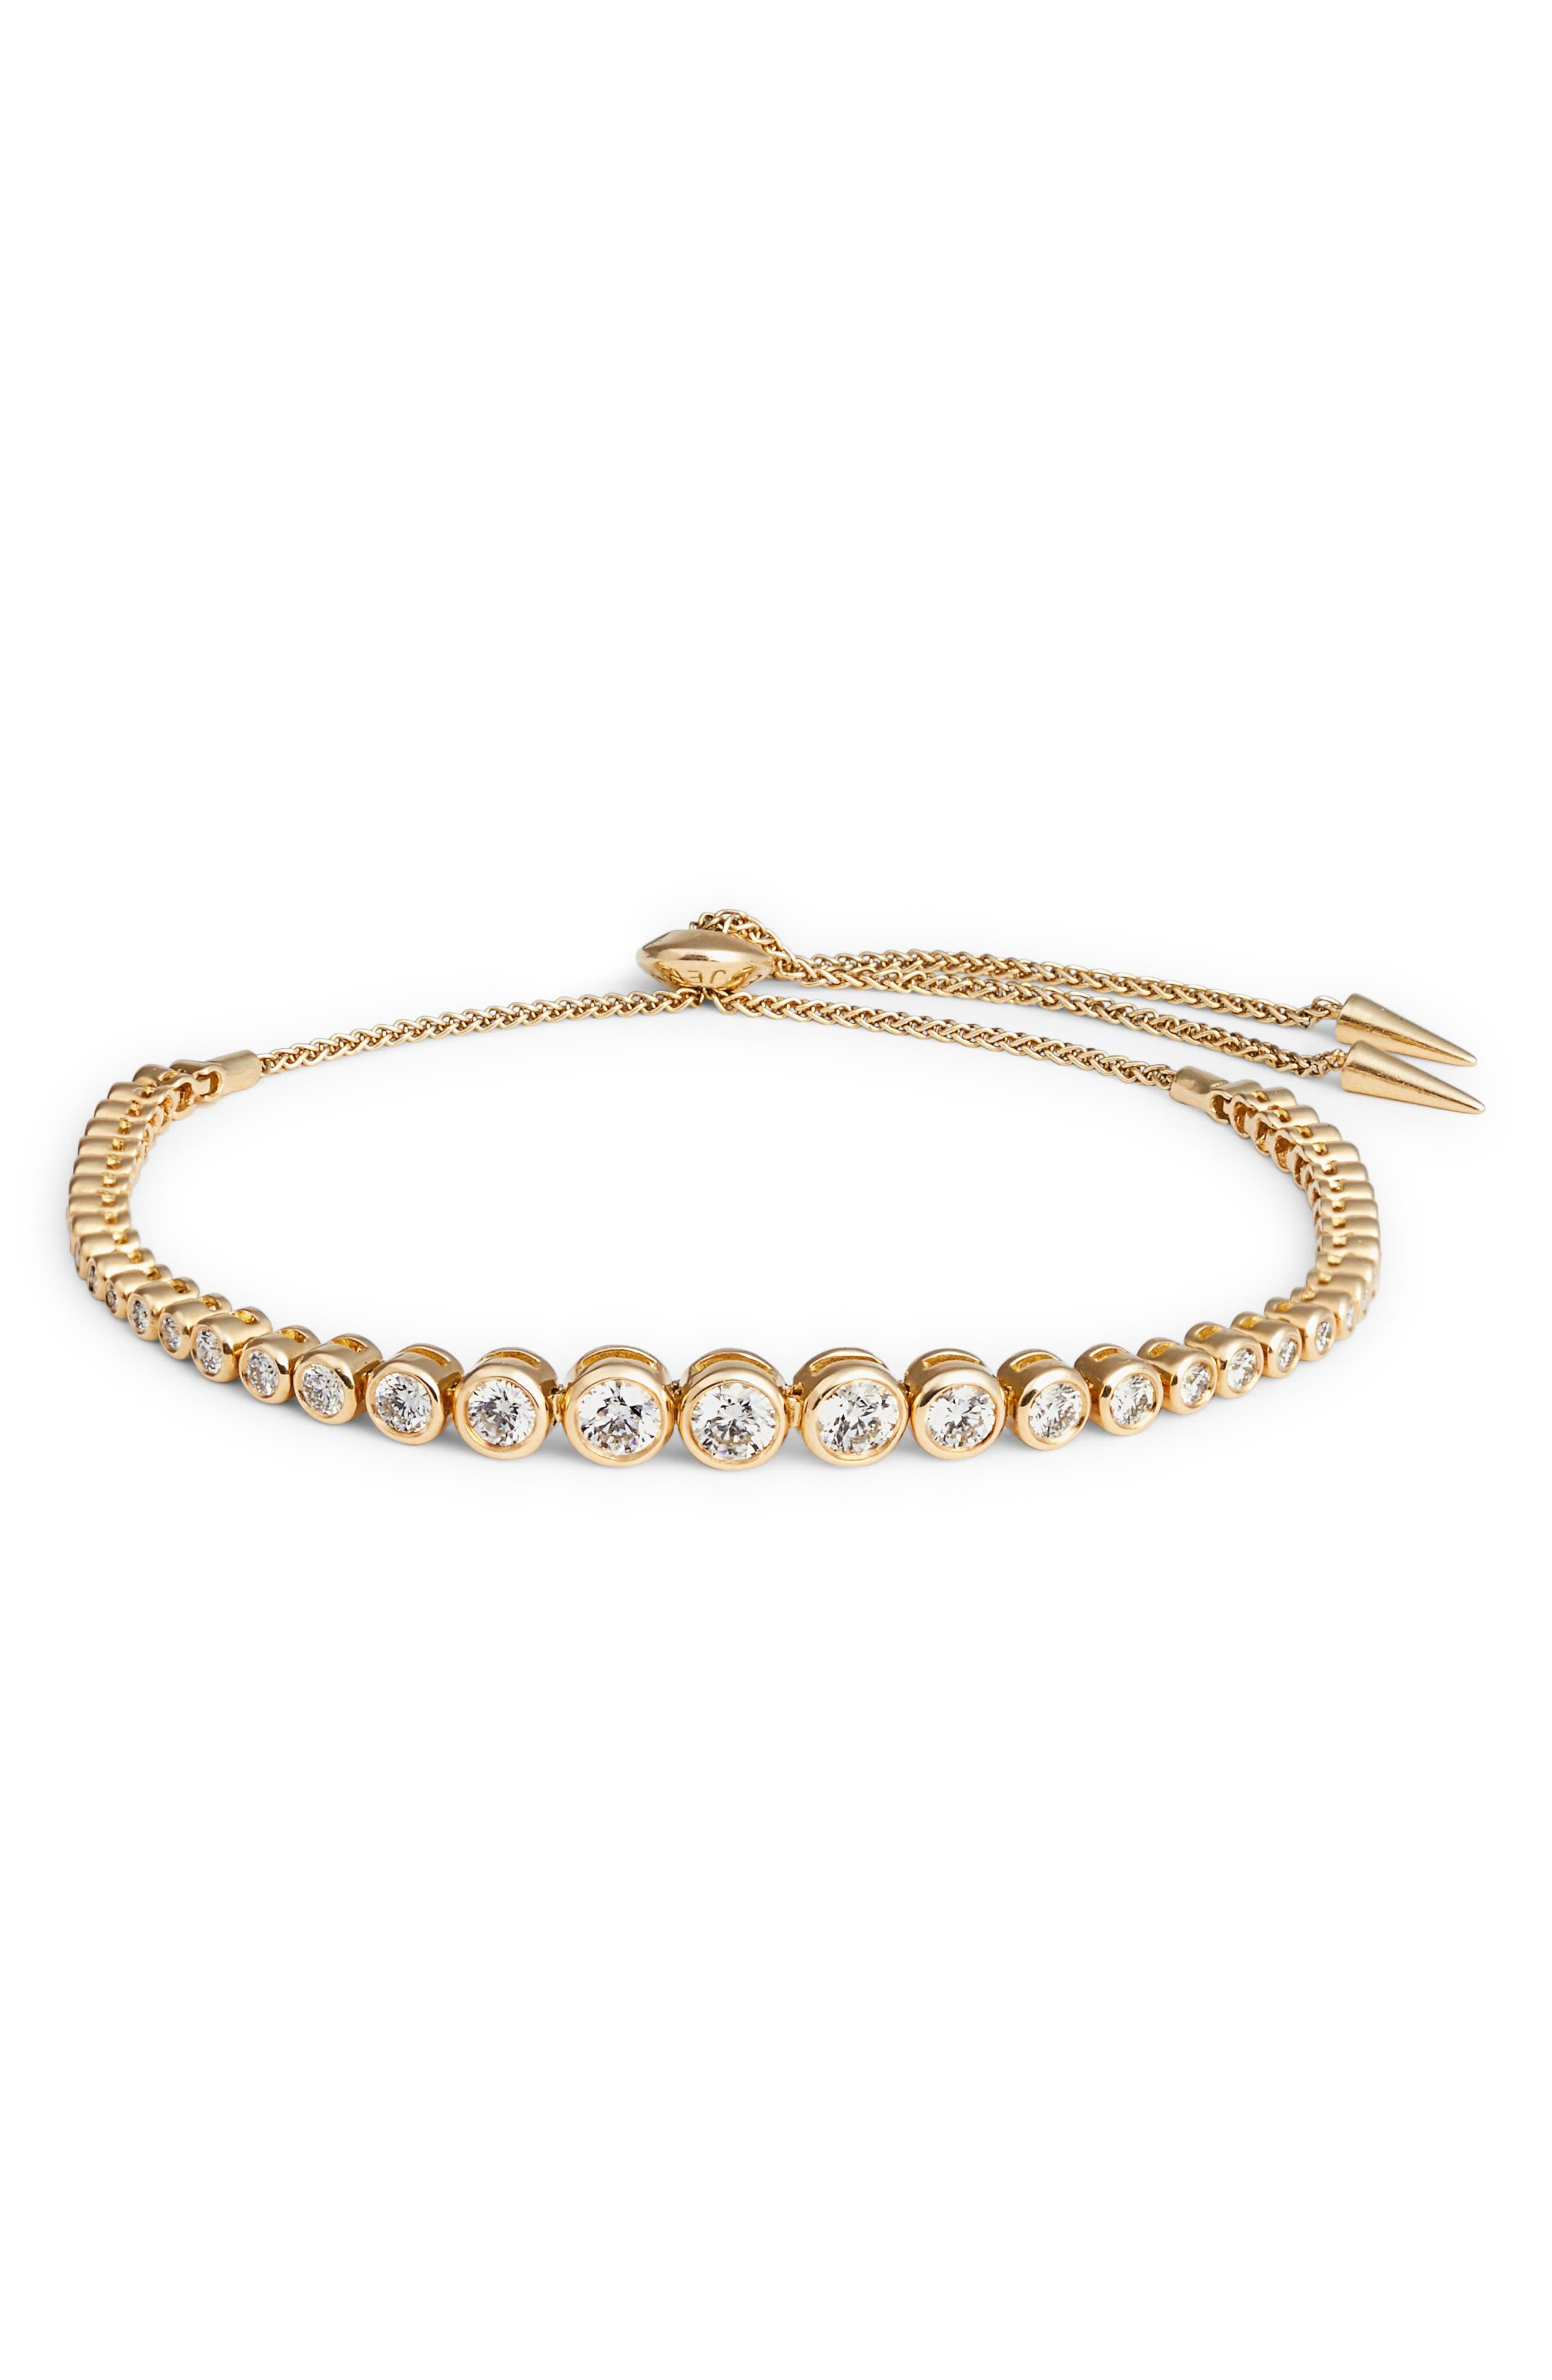 Prive Luxe Large Diamond Slider Bracelet,                             Main thumbnail 1, color,                             710